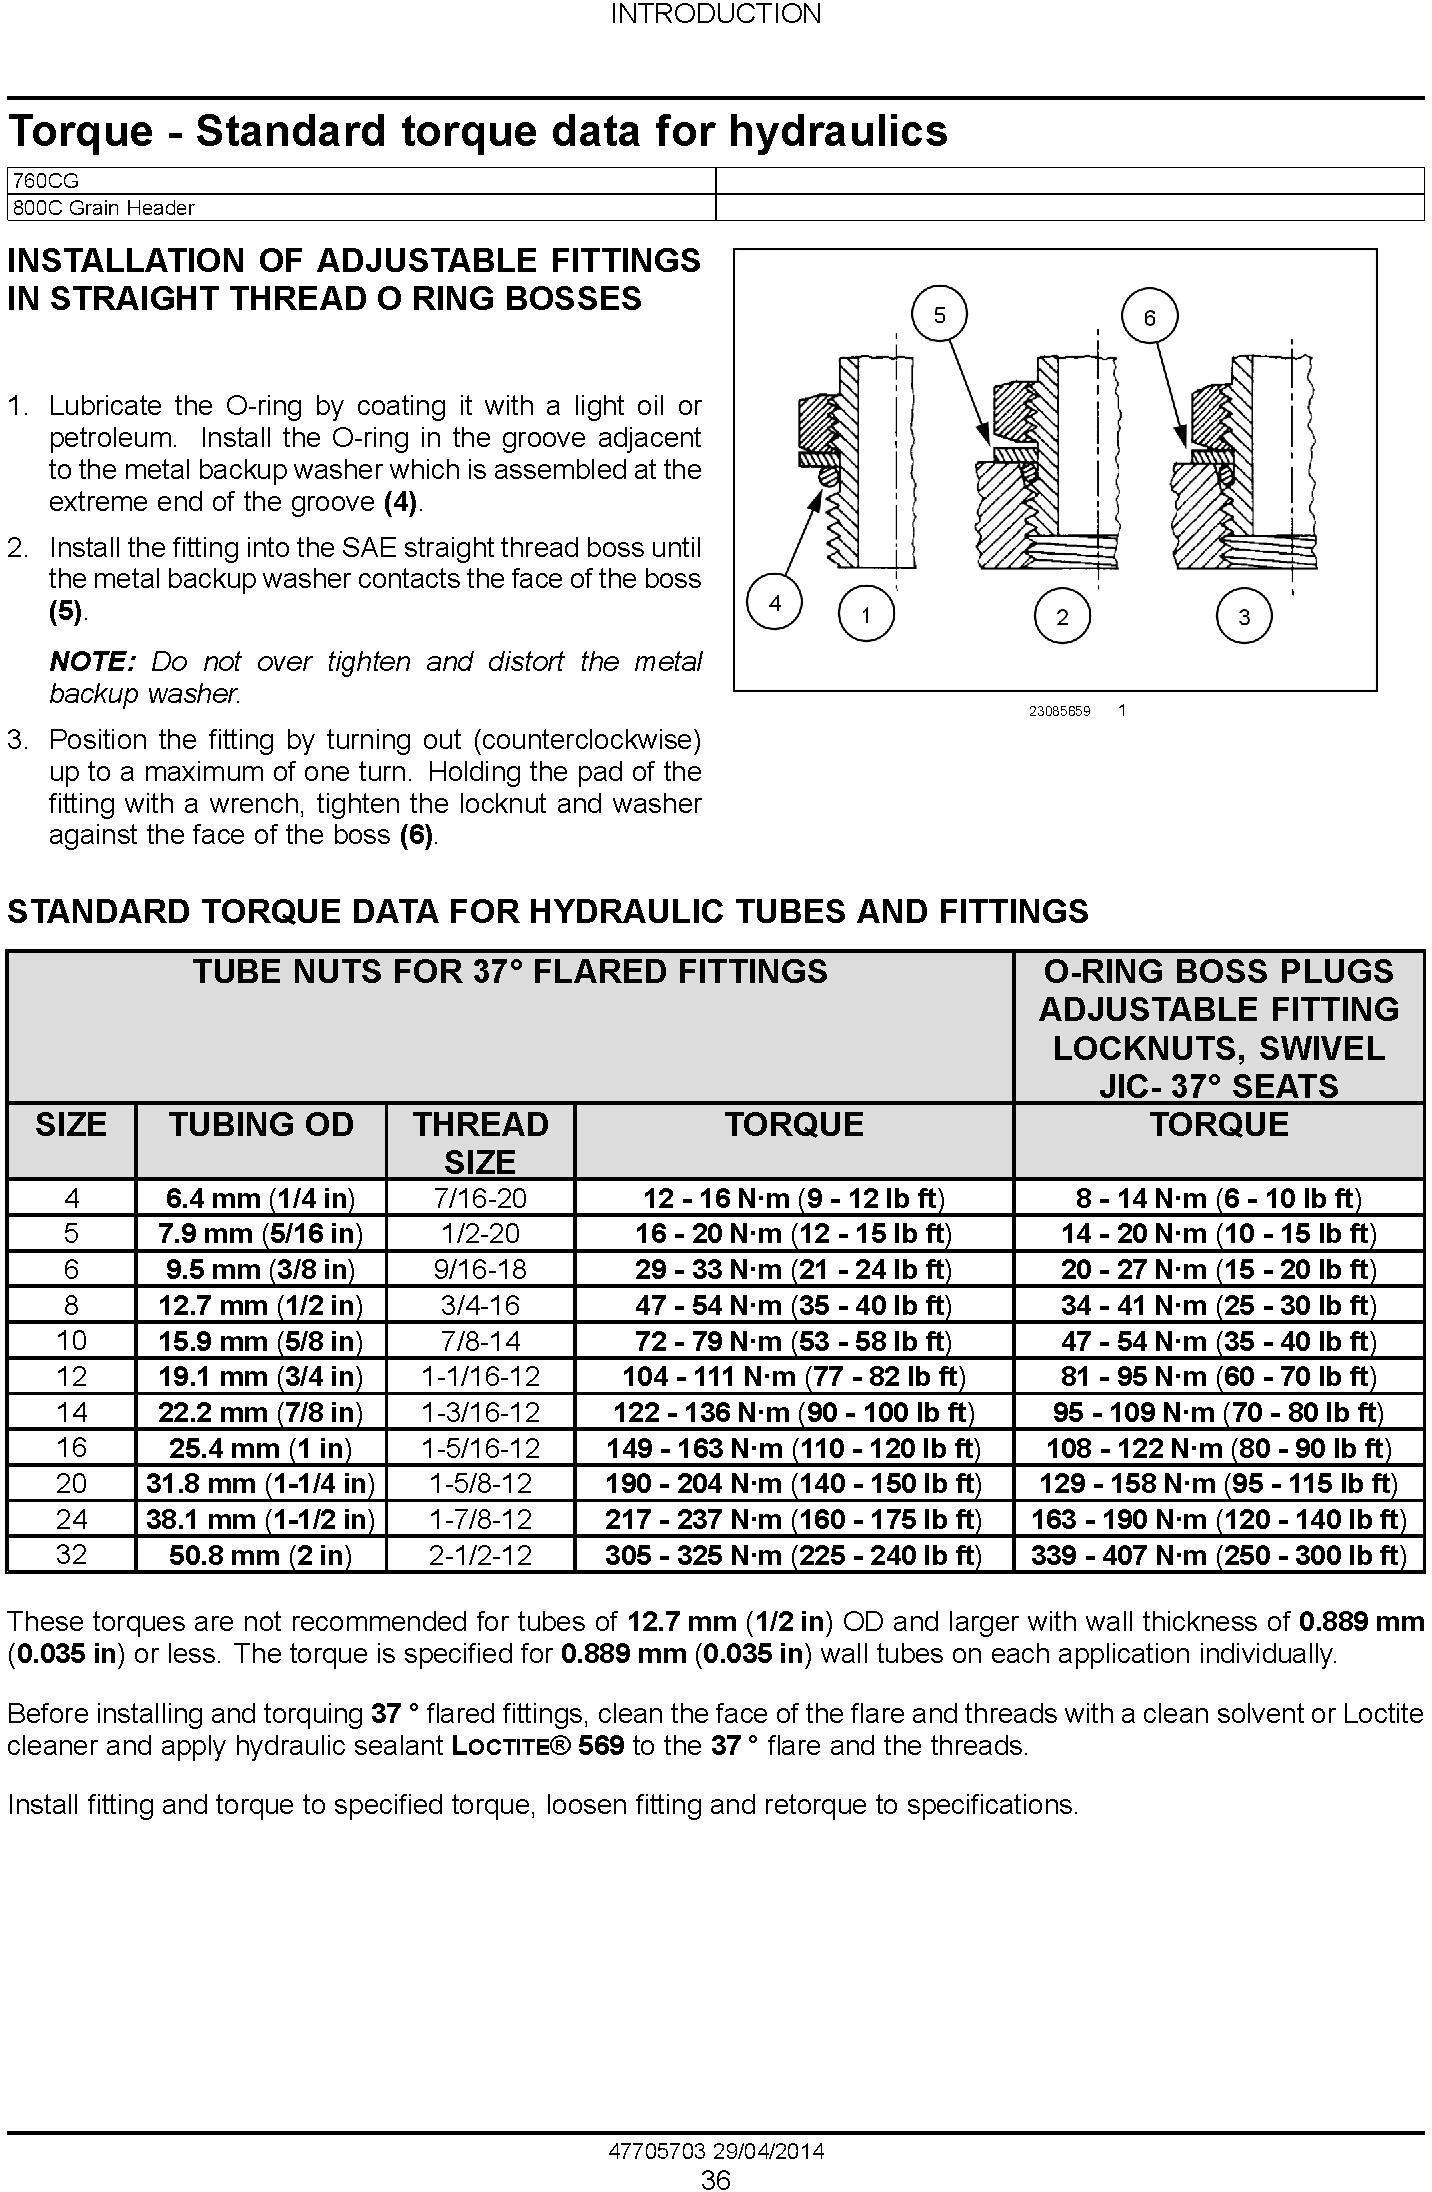 New Holland VariFeed 760CG Grain Header Service Manual - 2